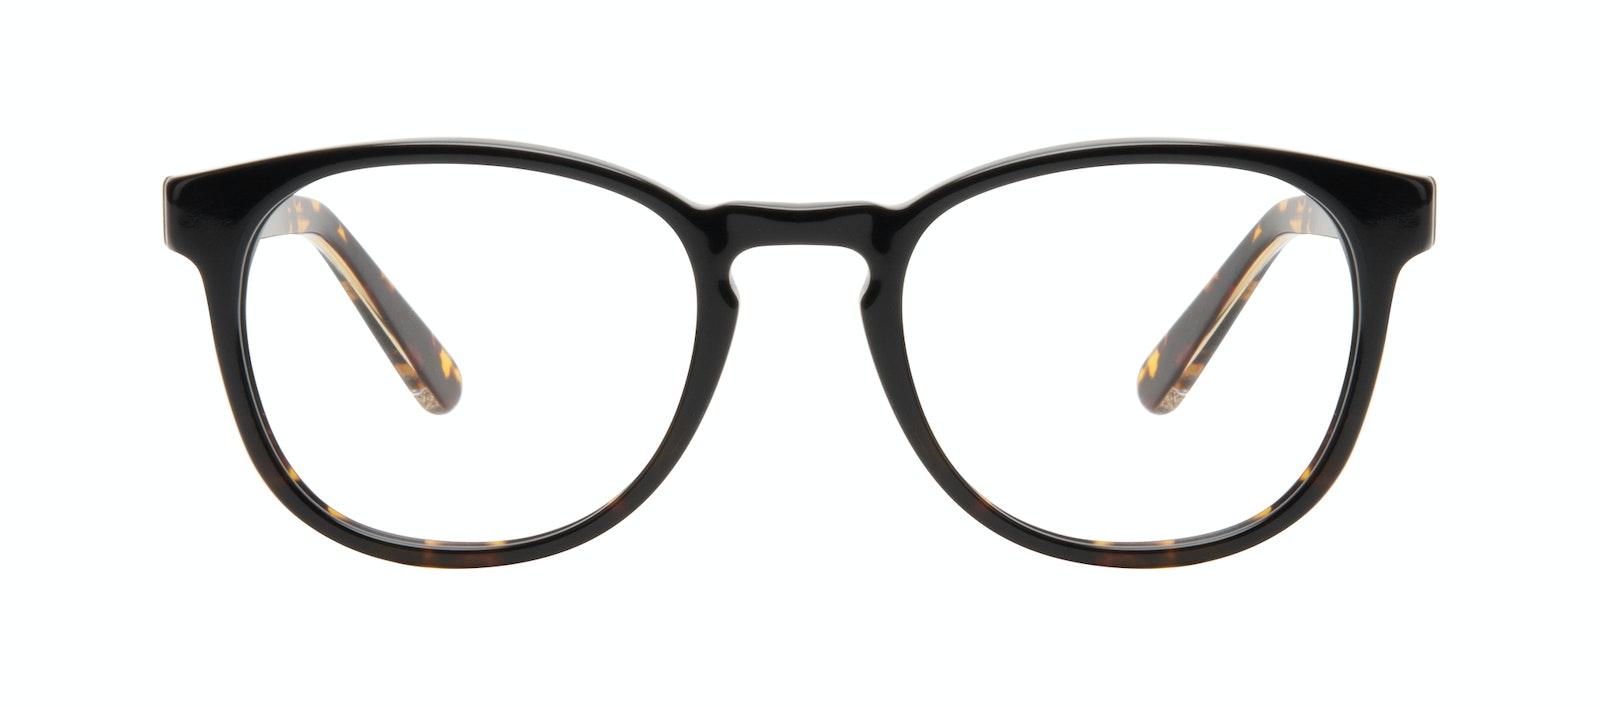 Affordable Fashion Glasses Round Eyeglasses Men Boreal Tundra Front